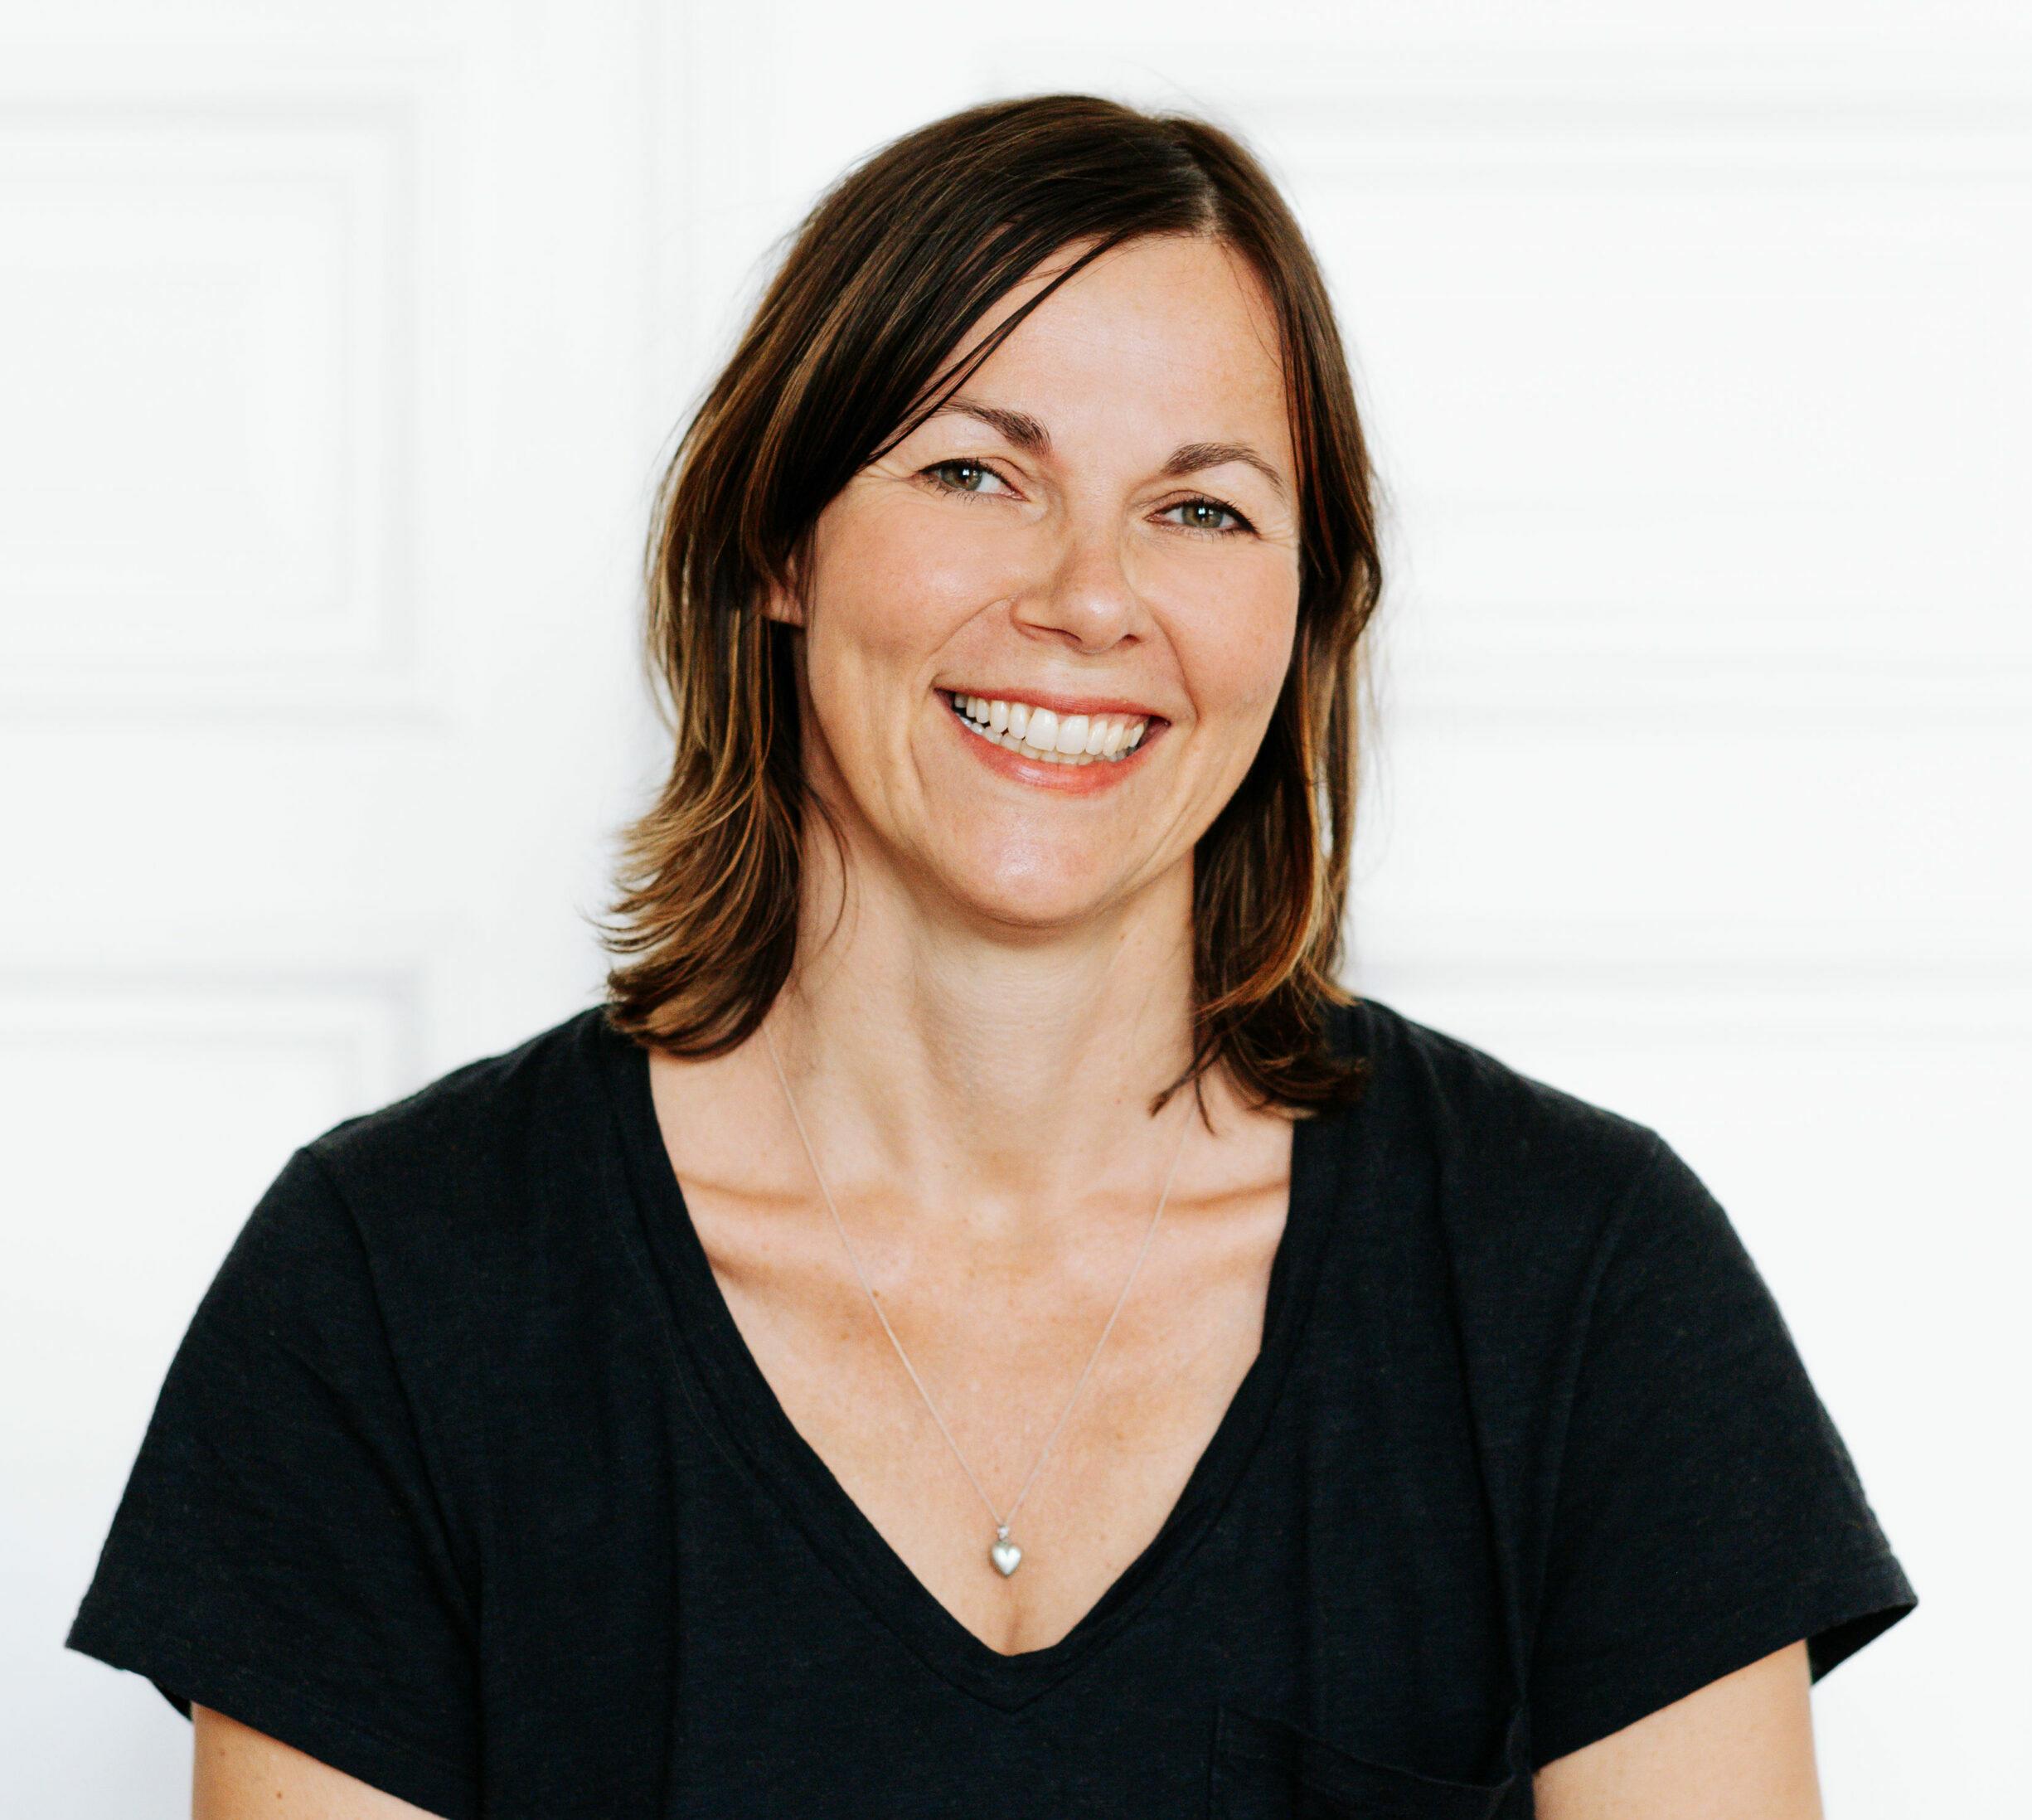 Portrait of Elisabeth Votypka - Yin Yoga teacher at RE:TREAT